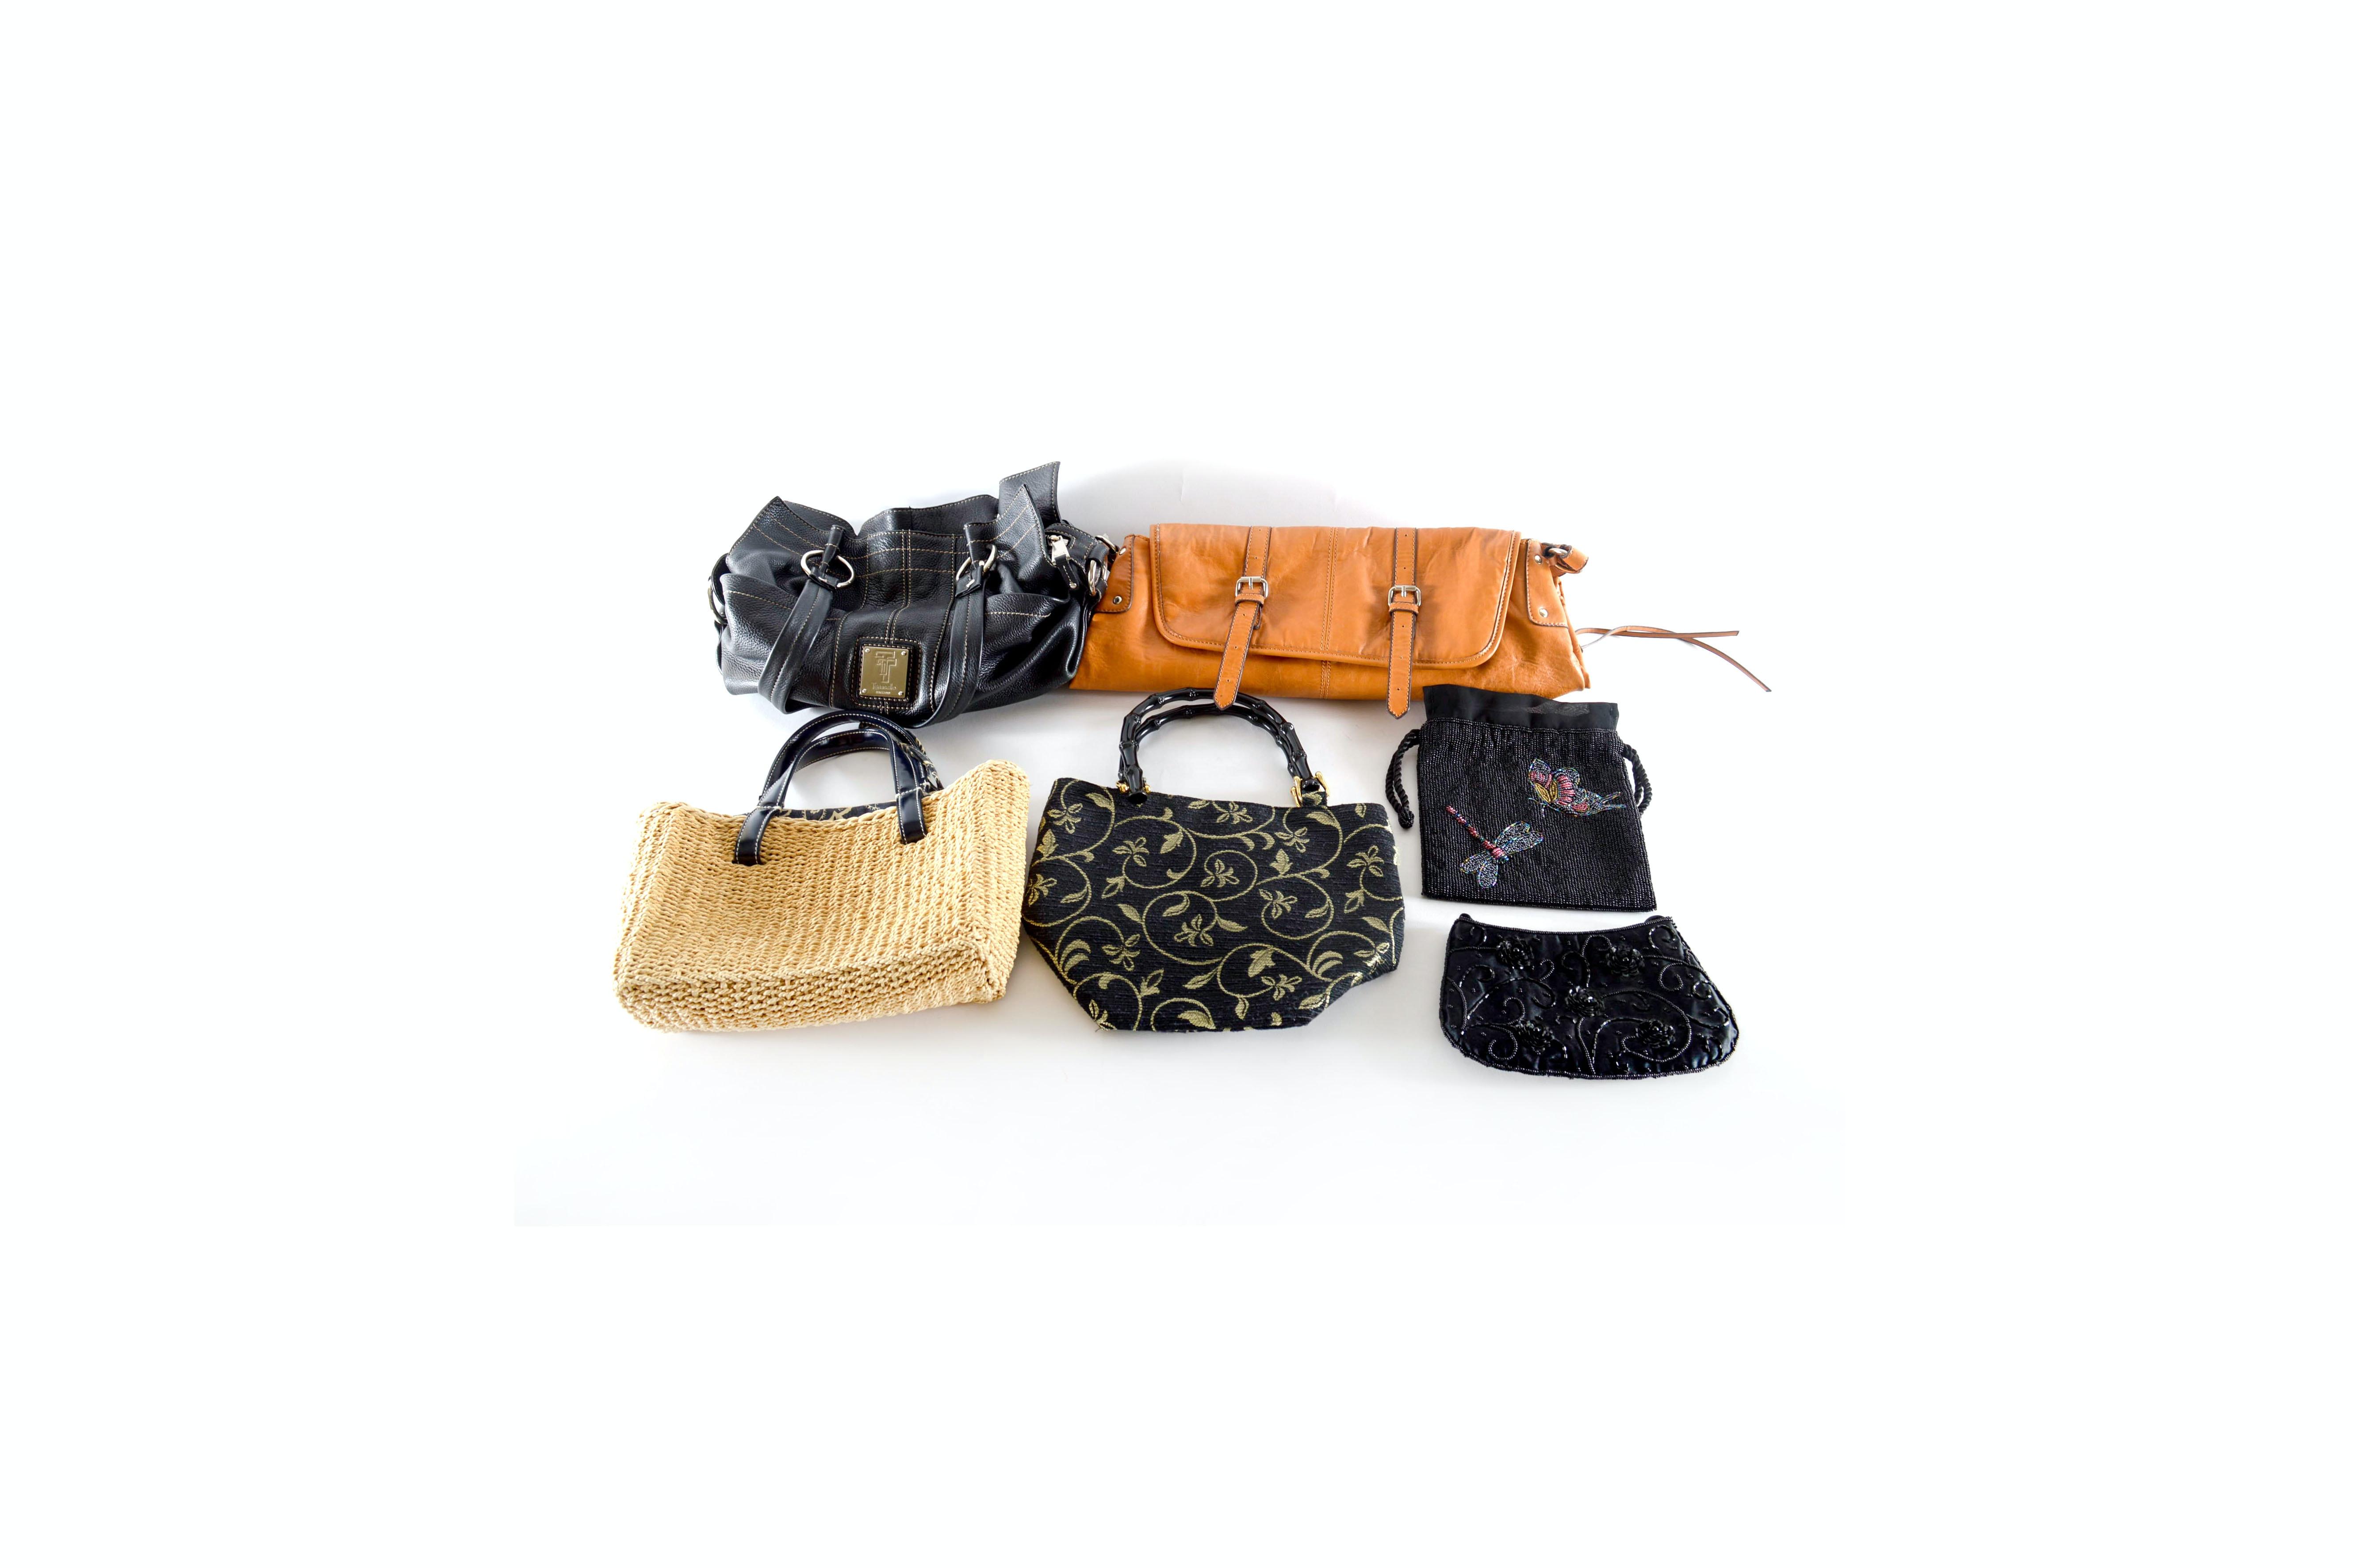 Collection of Purses and Handbags Including Tignanello